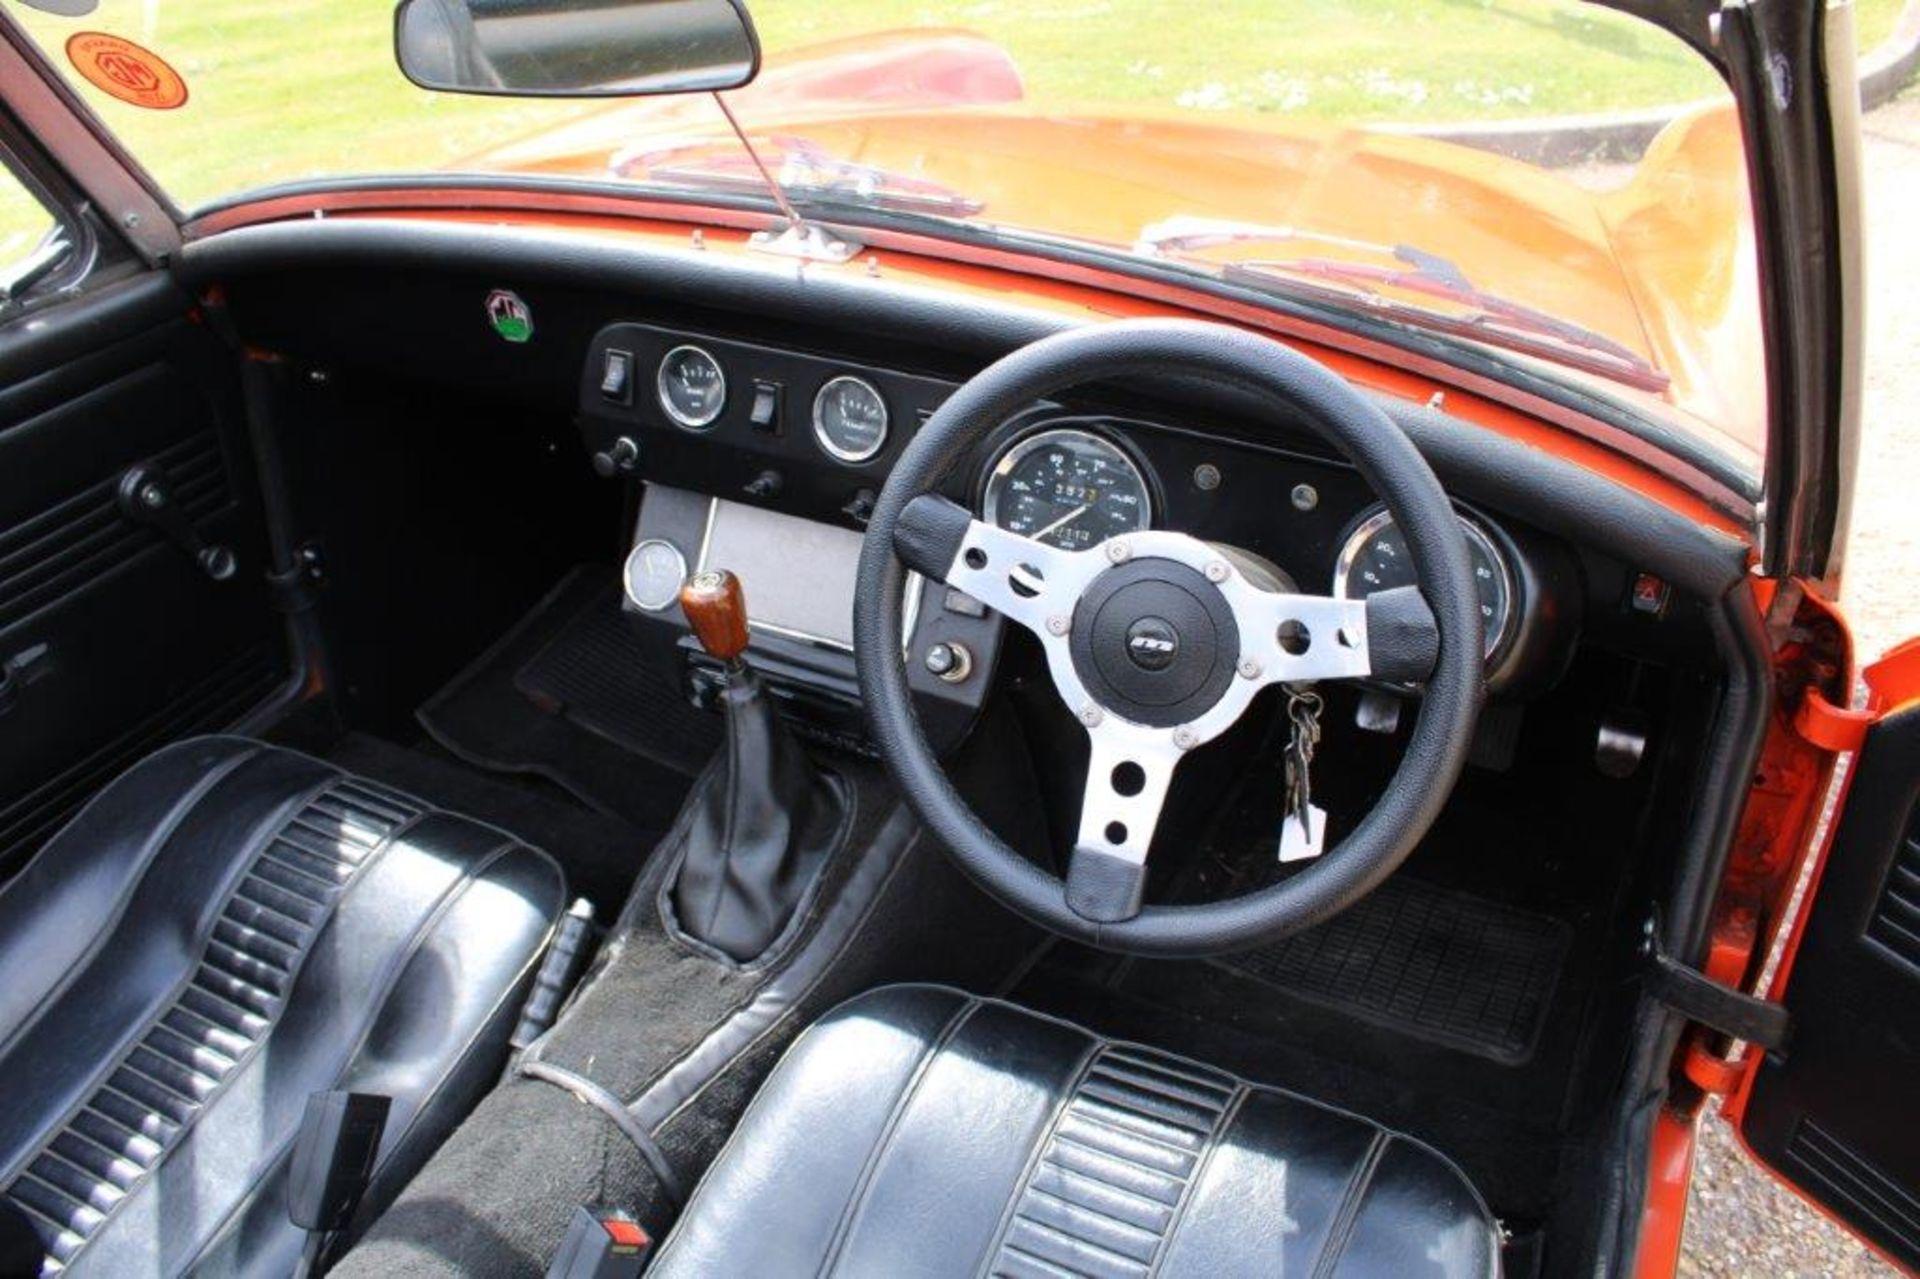 1979 MG Midget 1500 - Image 19 of 37